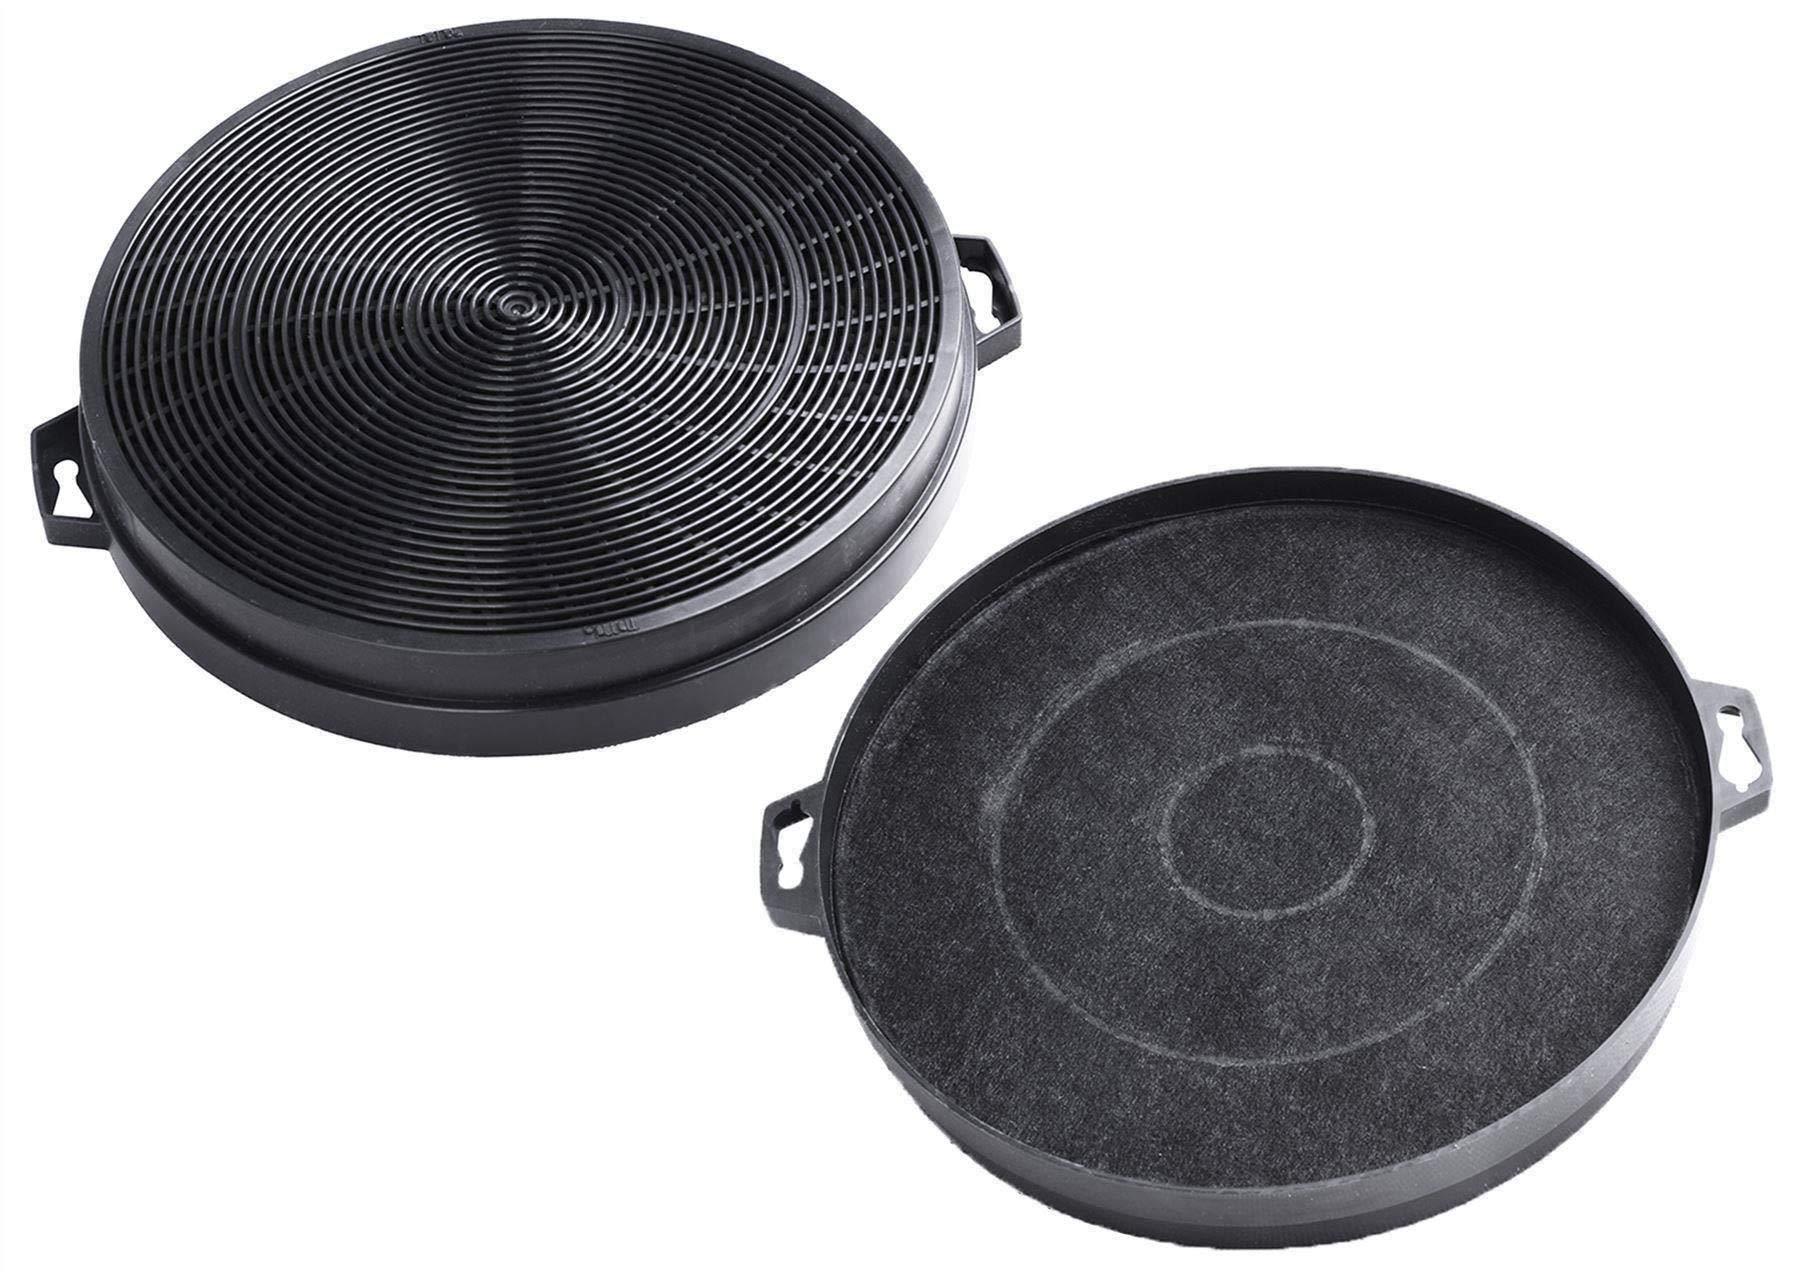 AquaHouse - Filtro de carbón para campana de cocina Siemens 353121, Bosch DHZ5140, Neff 00353121, filtro de carbón para extractor de cocina (CHF02S): Amazon.es: Hogar